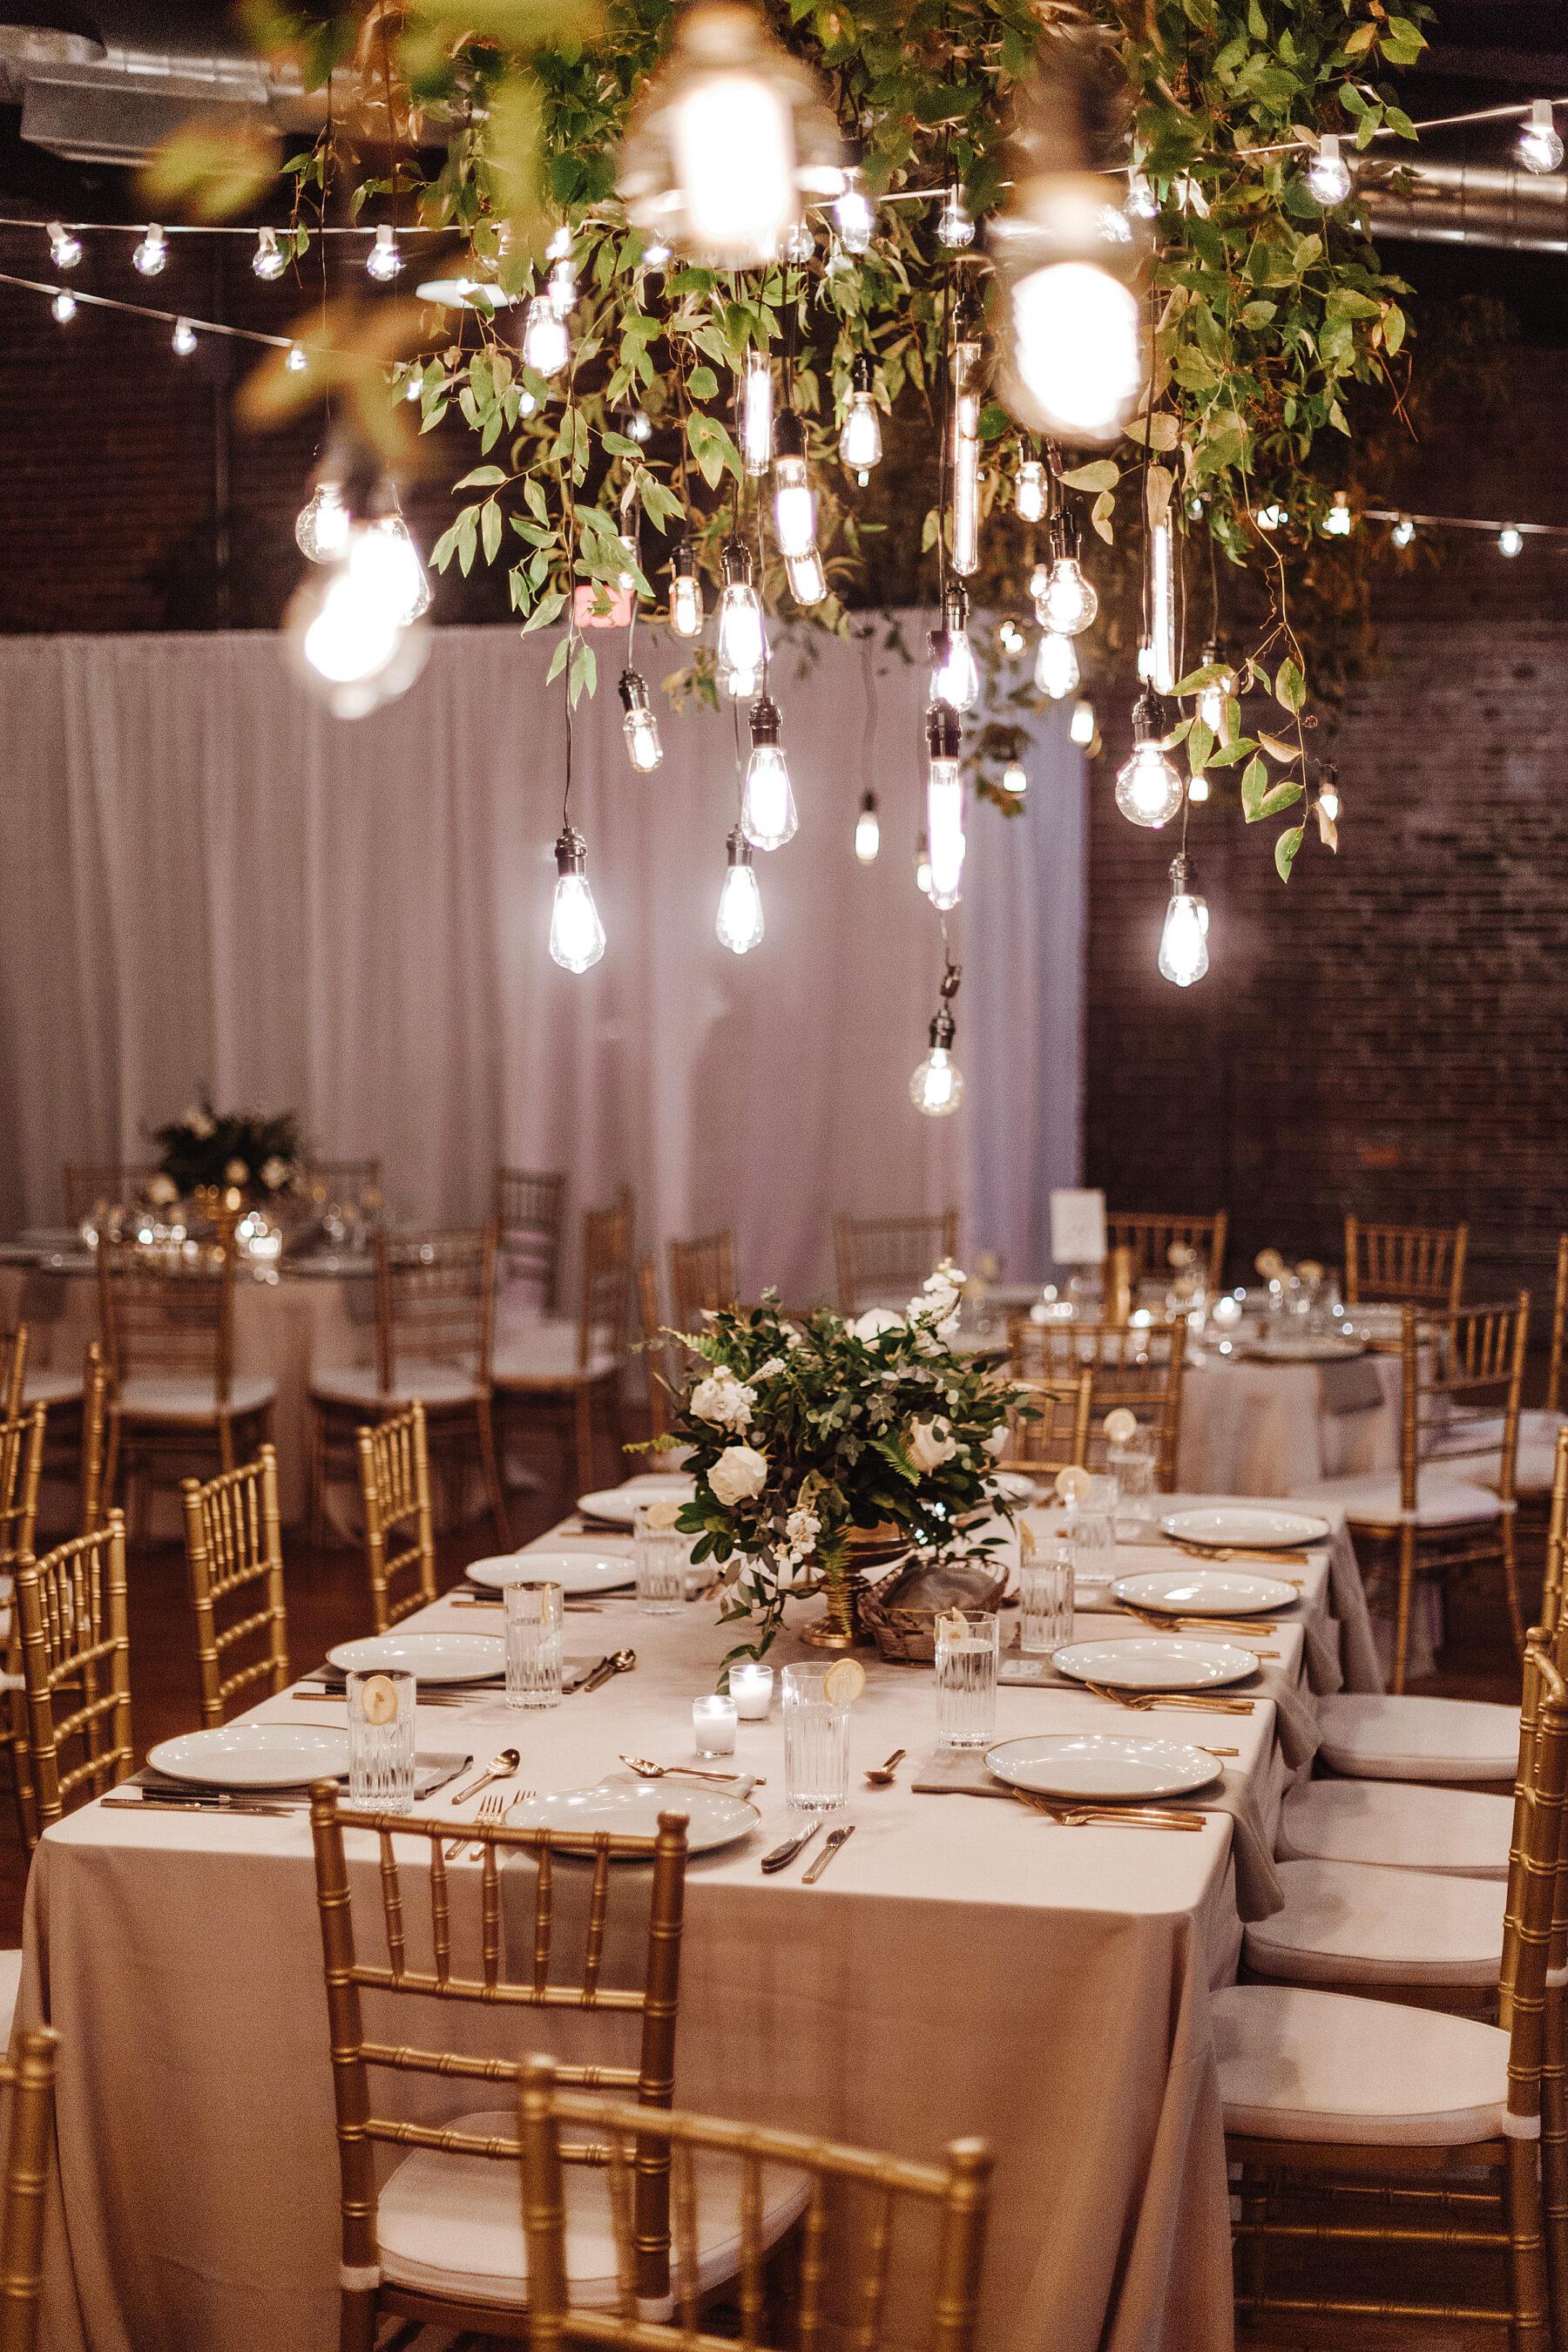 Premier W.E.D. wedding at Cannery Ballroom